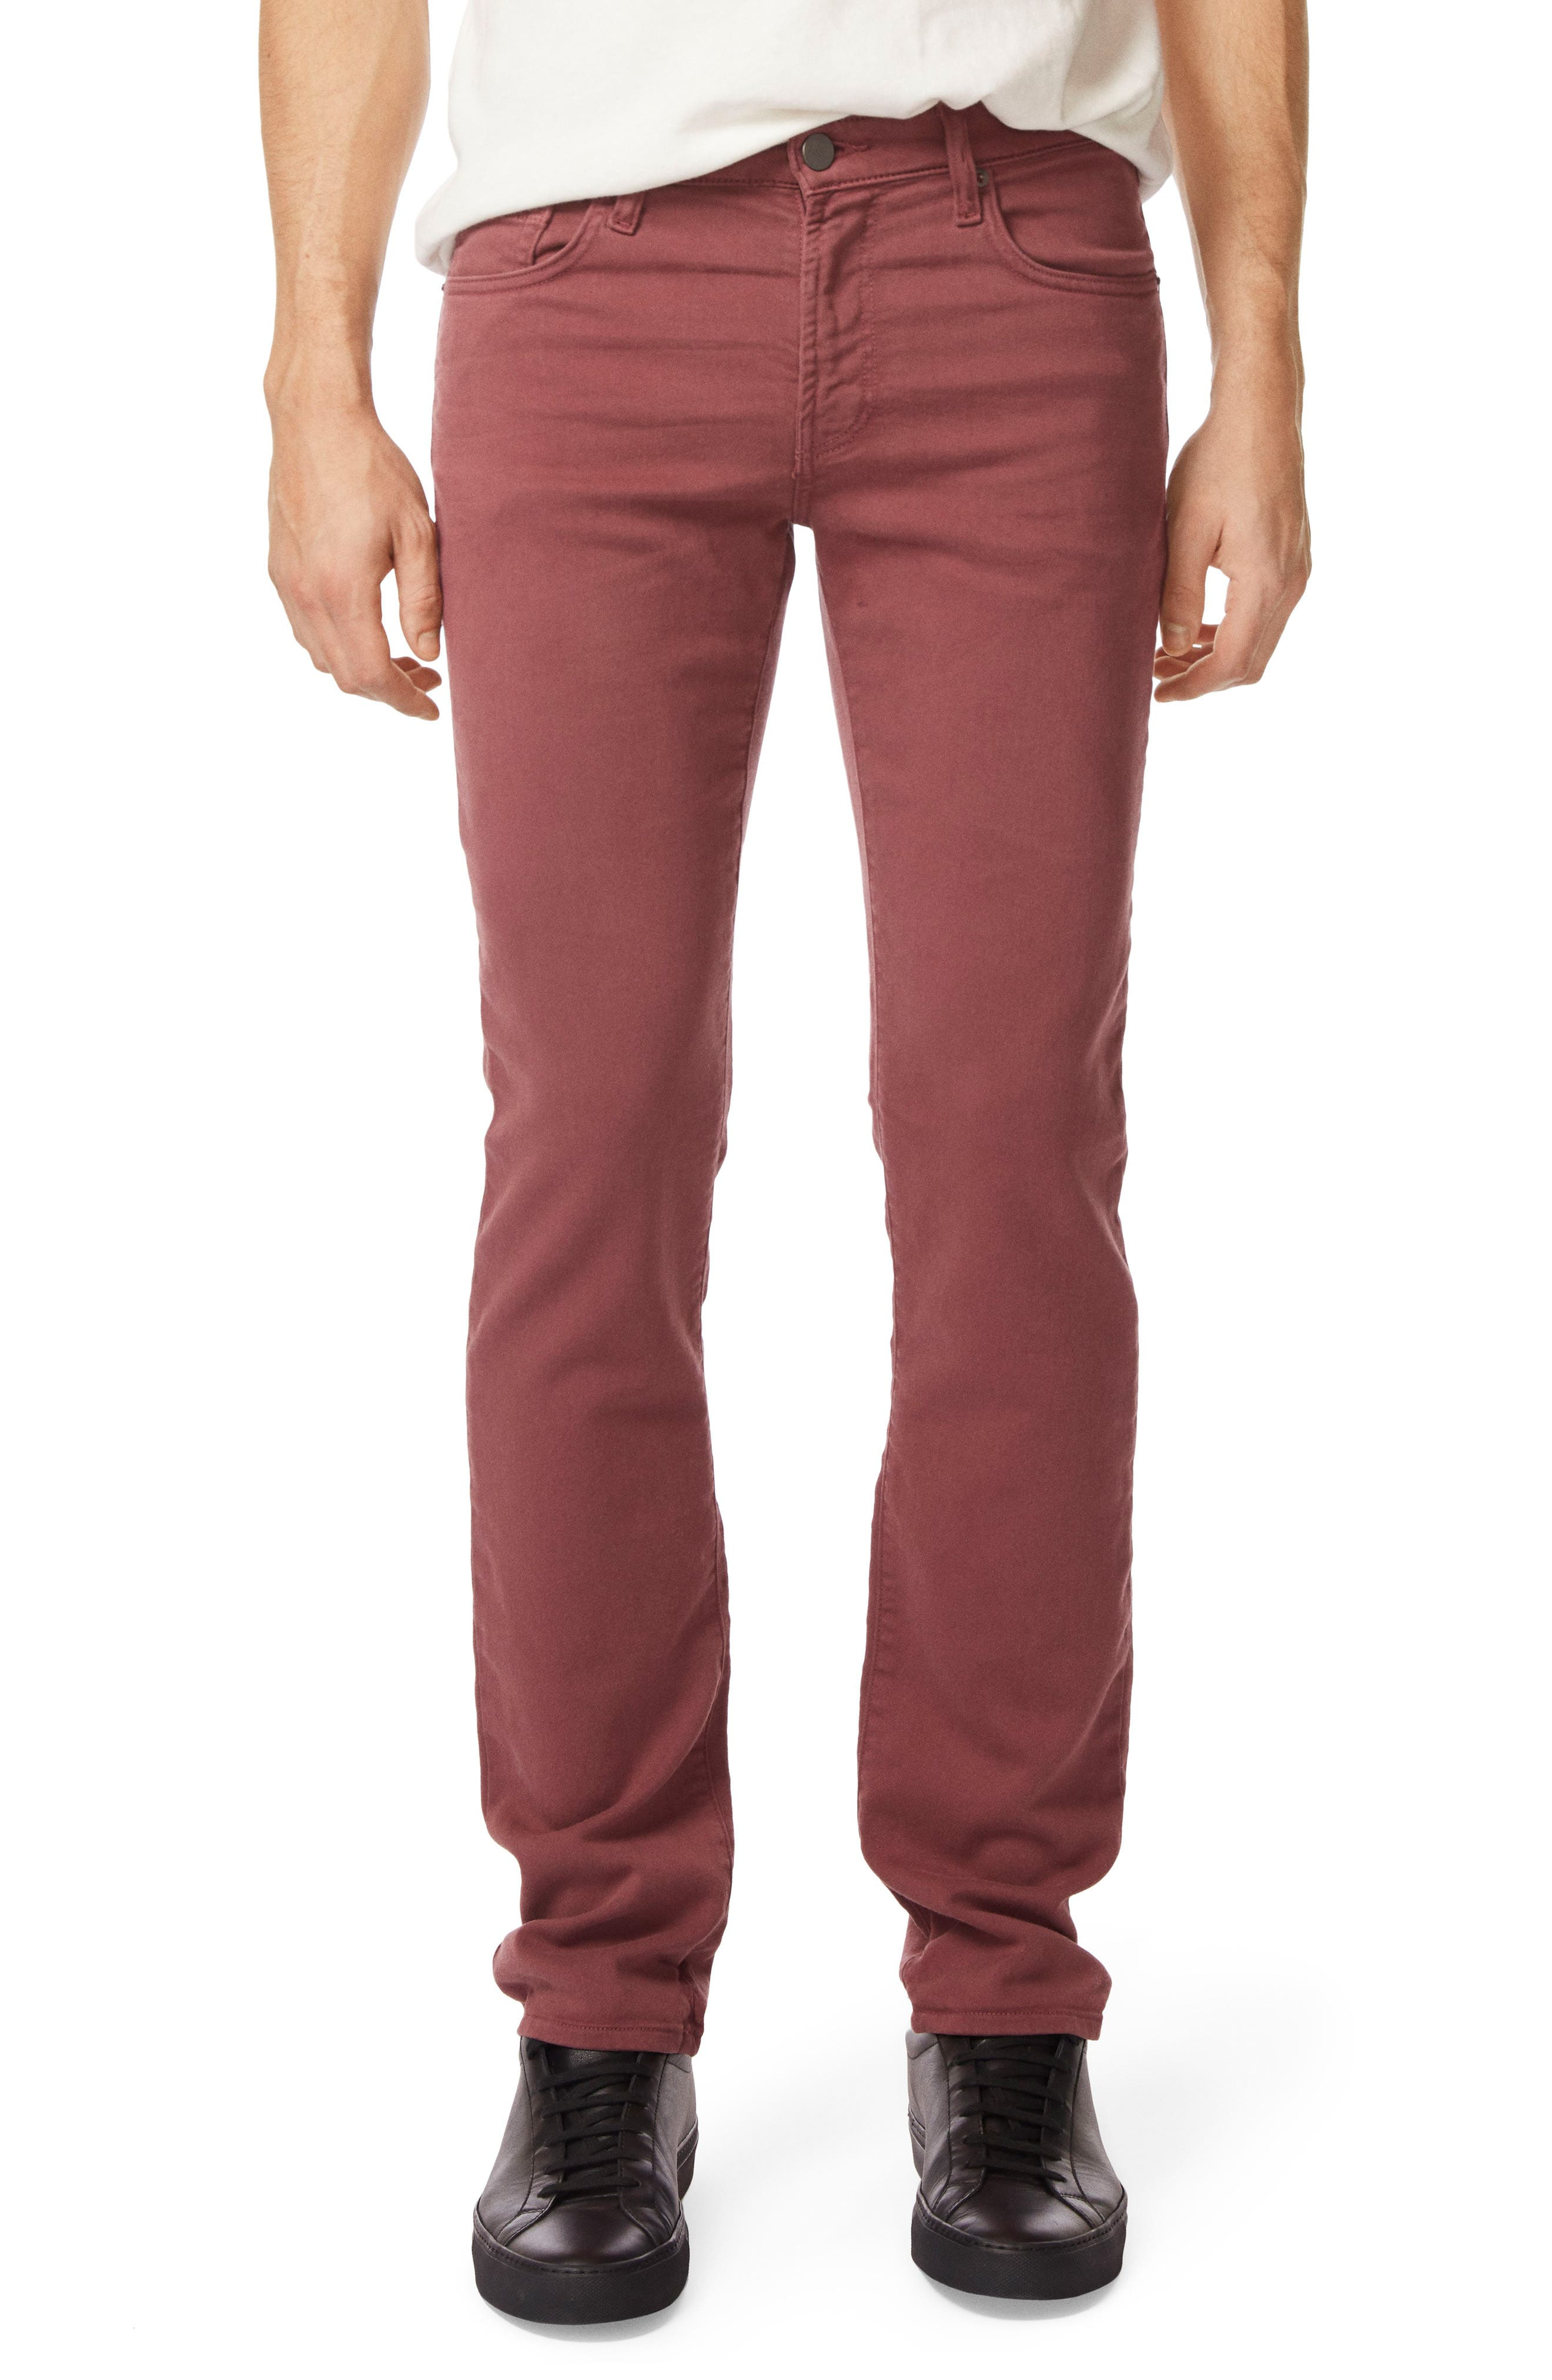 Kane Slim Straight Leg Pants,                         Main,                         color, Keckley Basella